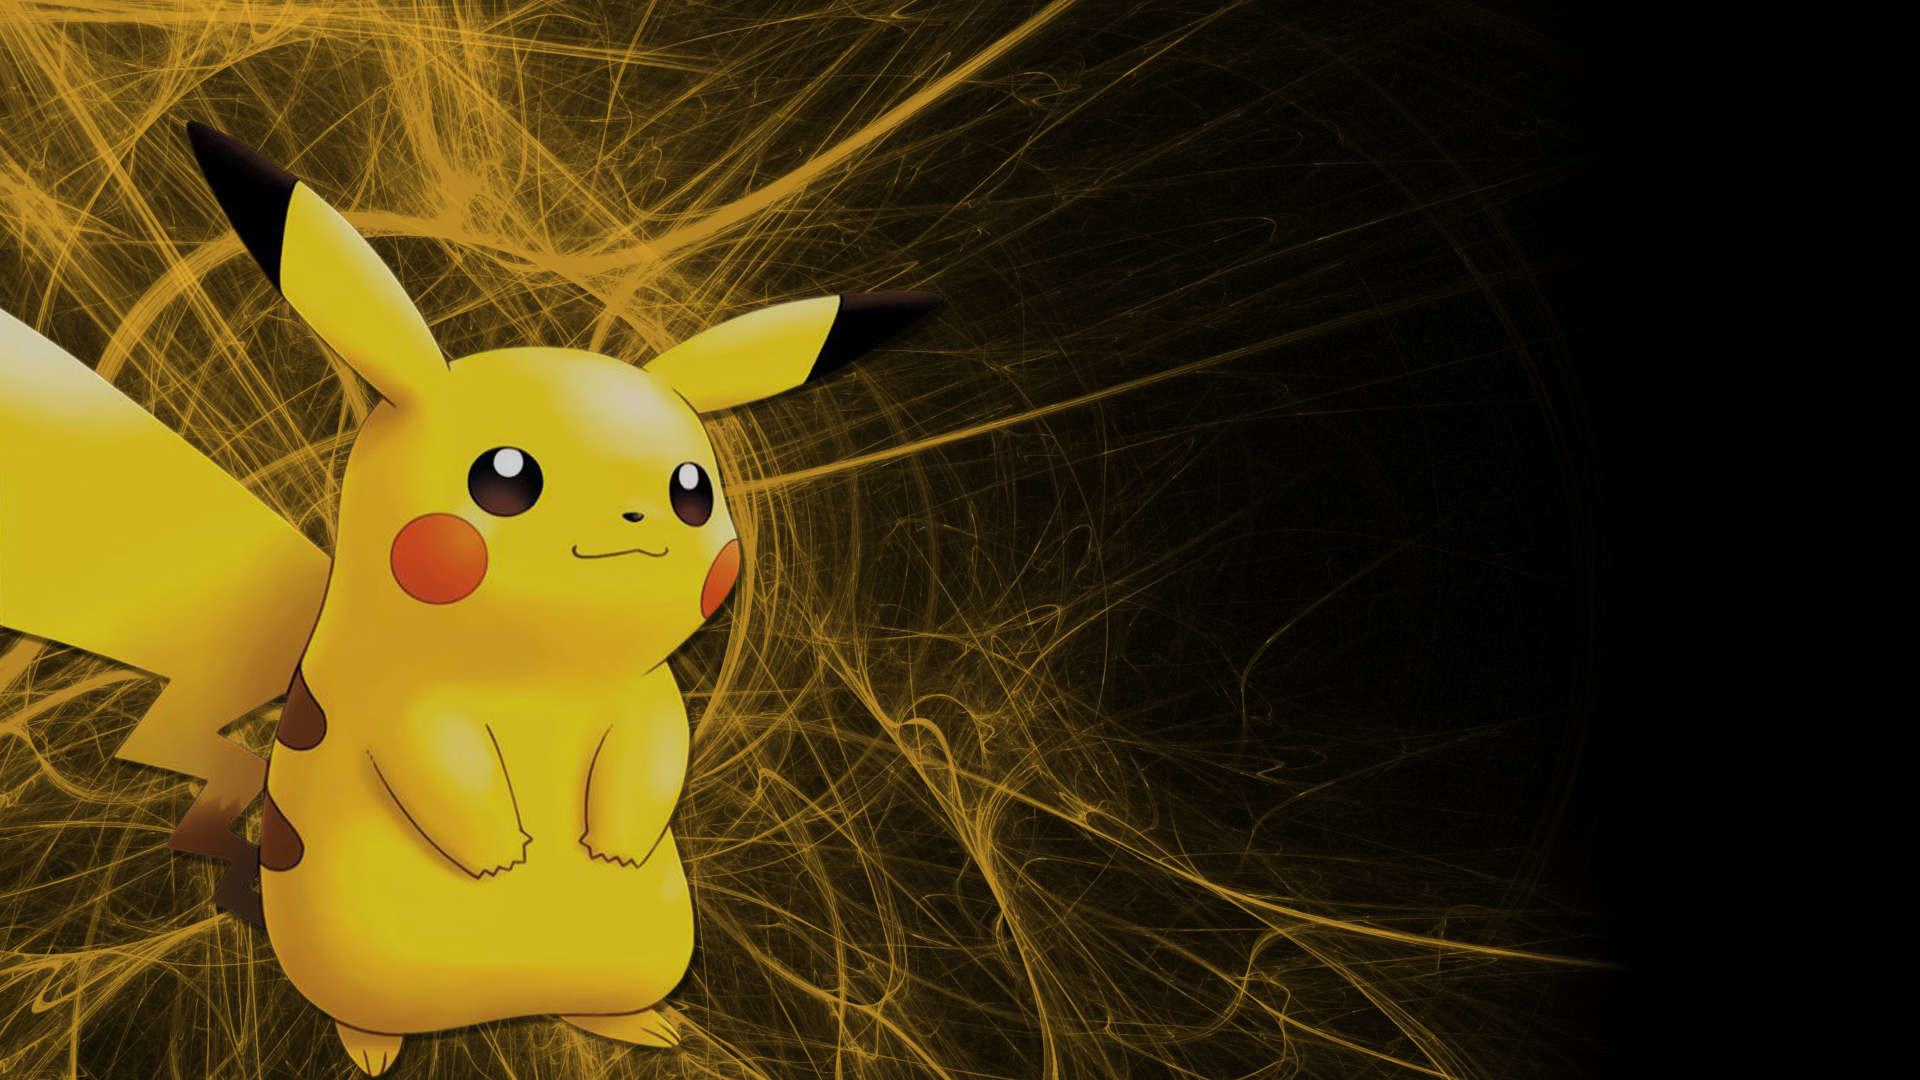 Pikachu HD Wallpaper (81+ images)